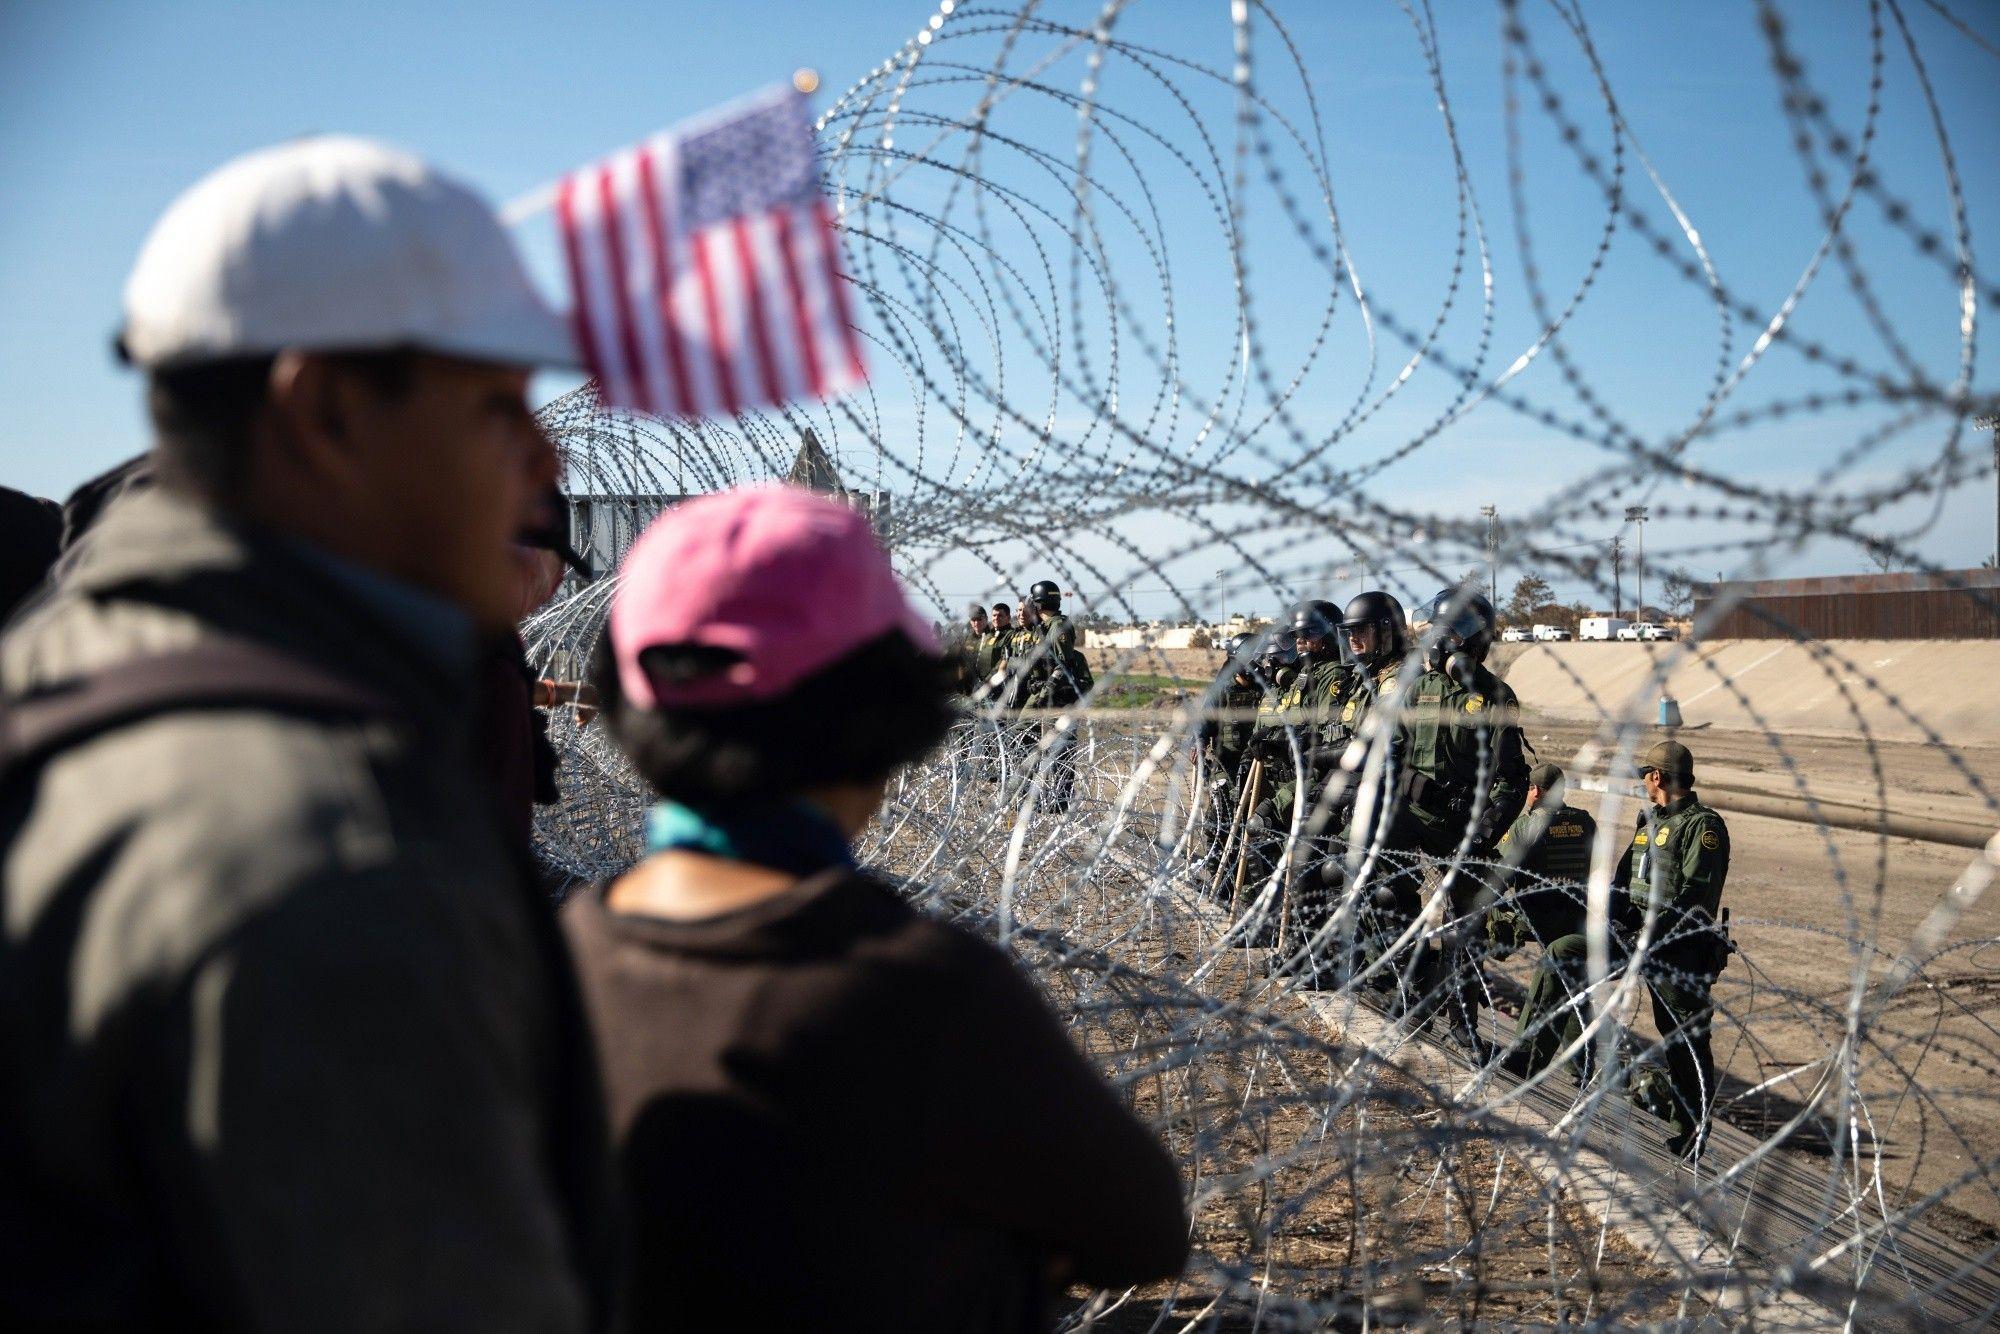 Central American Migrants In Tijuana As Tension Rise Amid U.S. Agents Border Crossing Closure